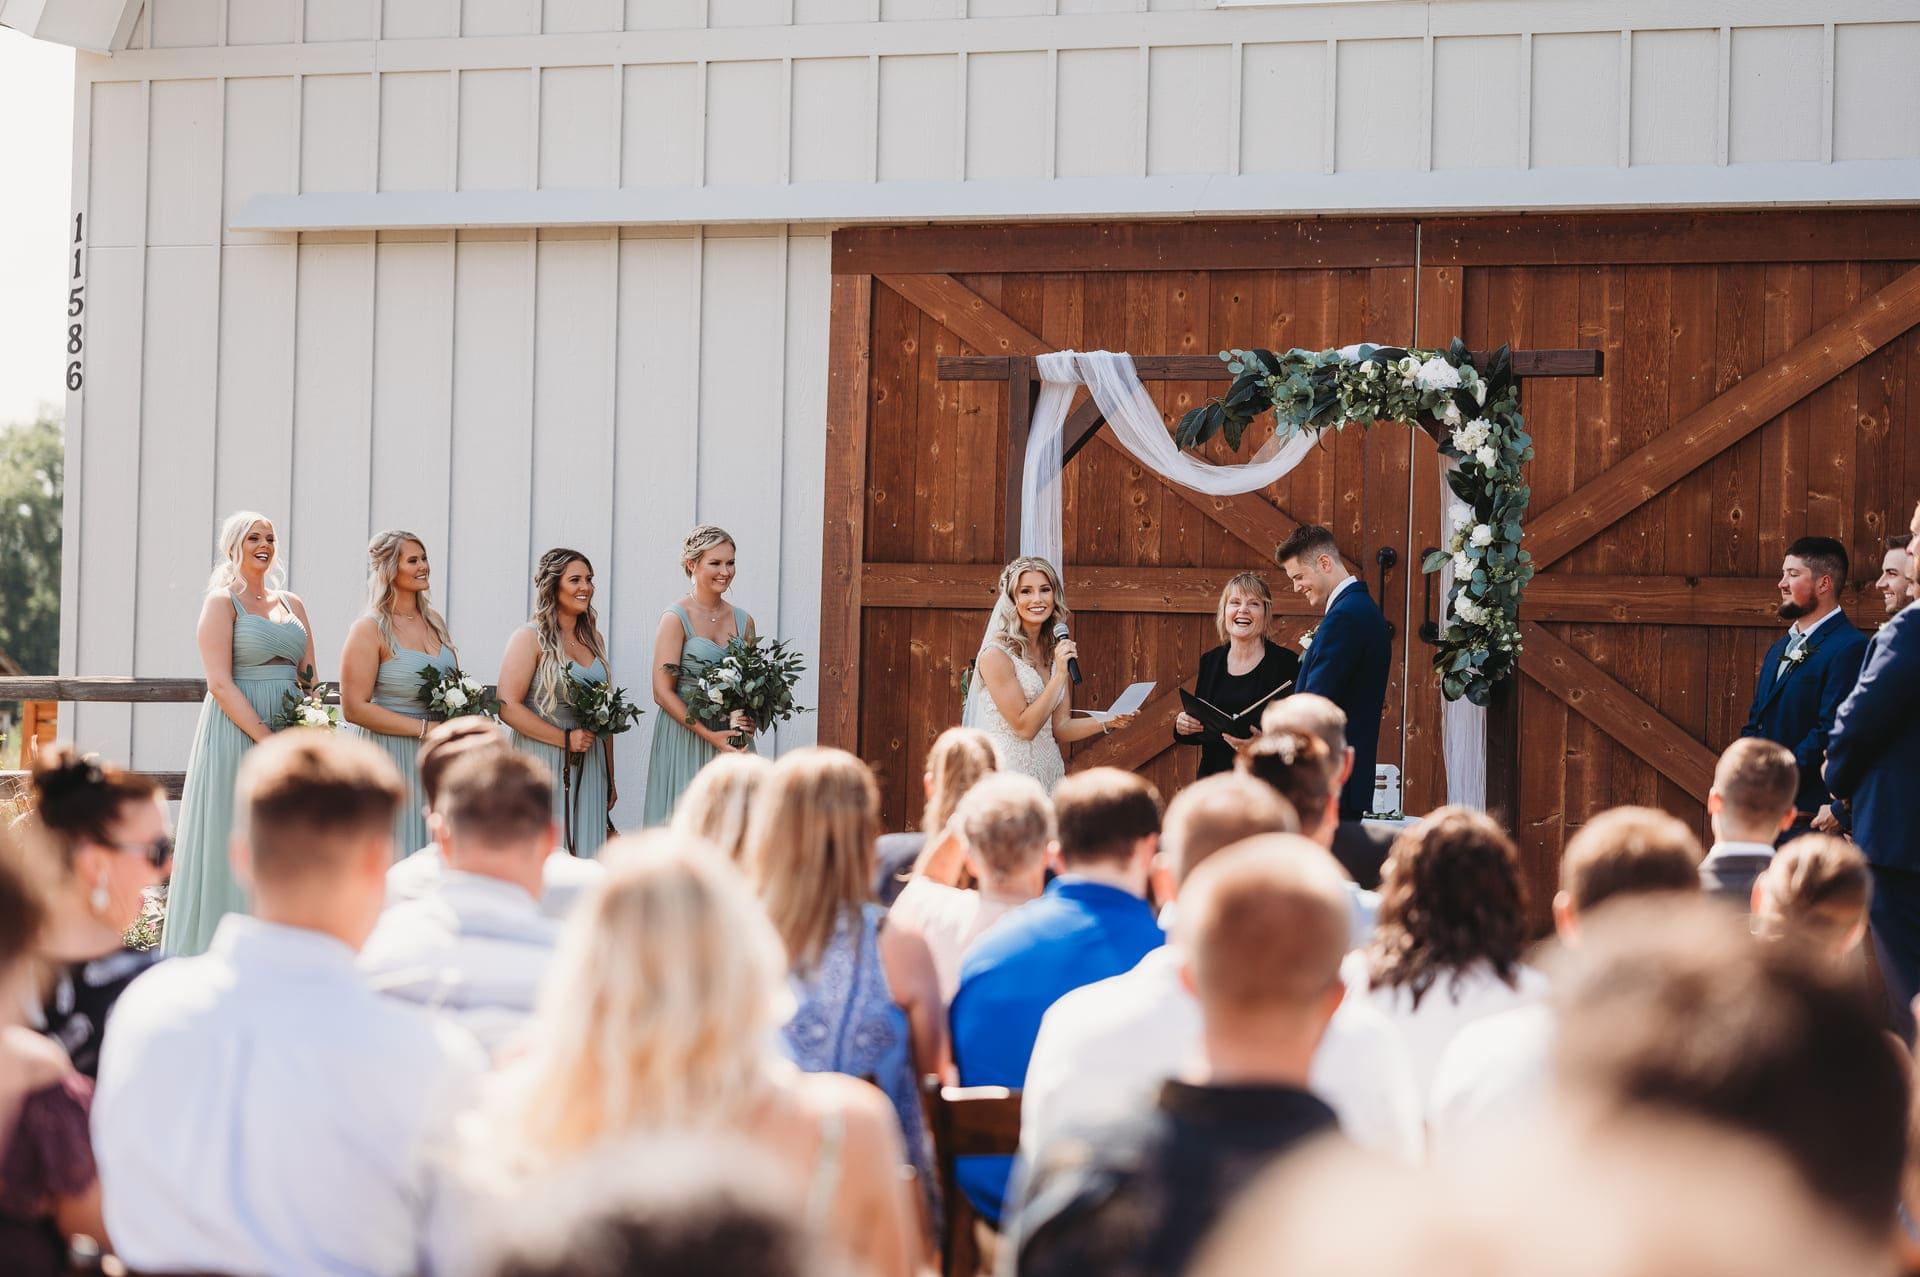 Wedding Ceremony Guests Richland Michigan Wedding Photography